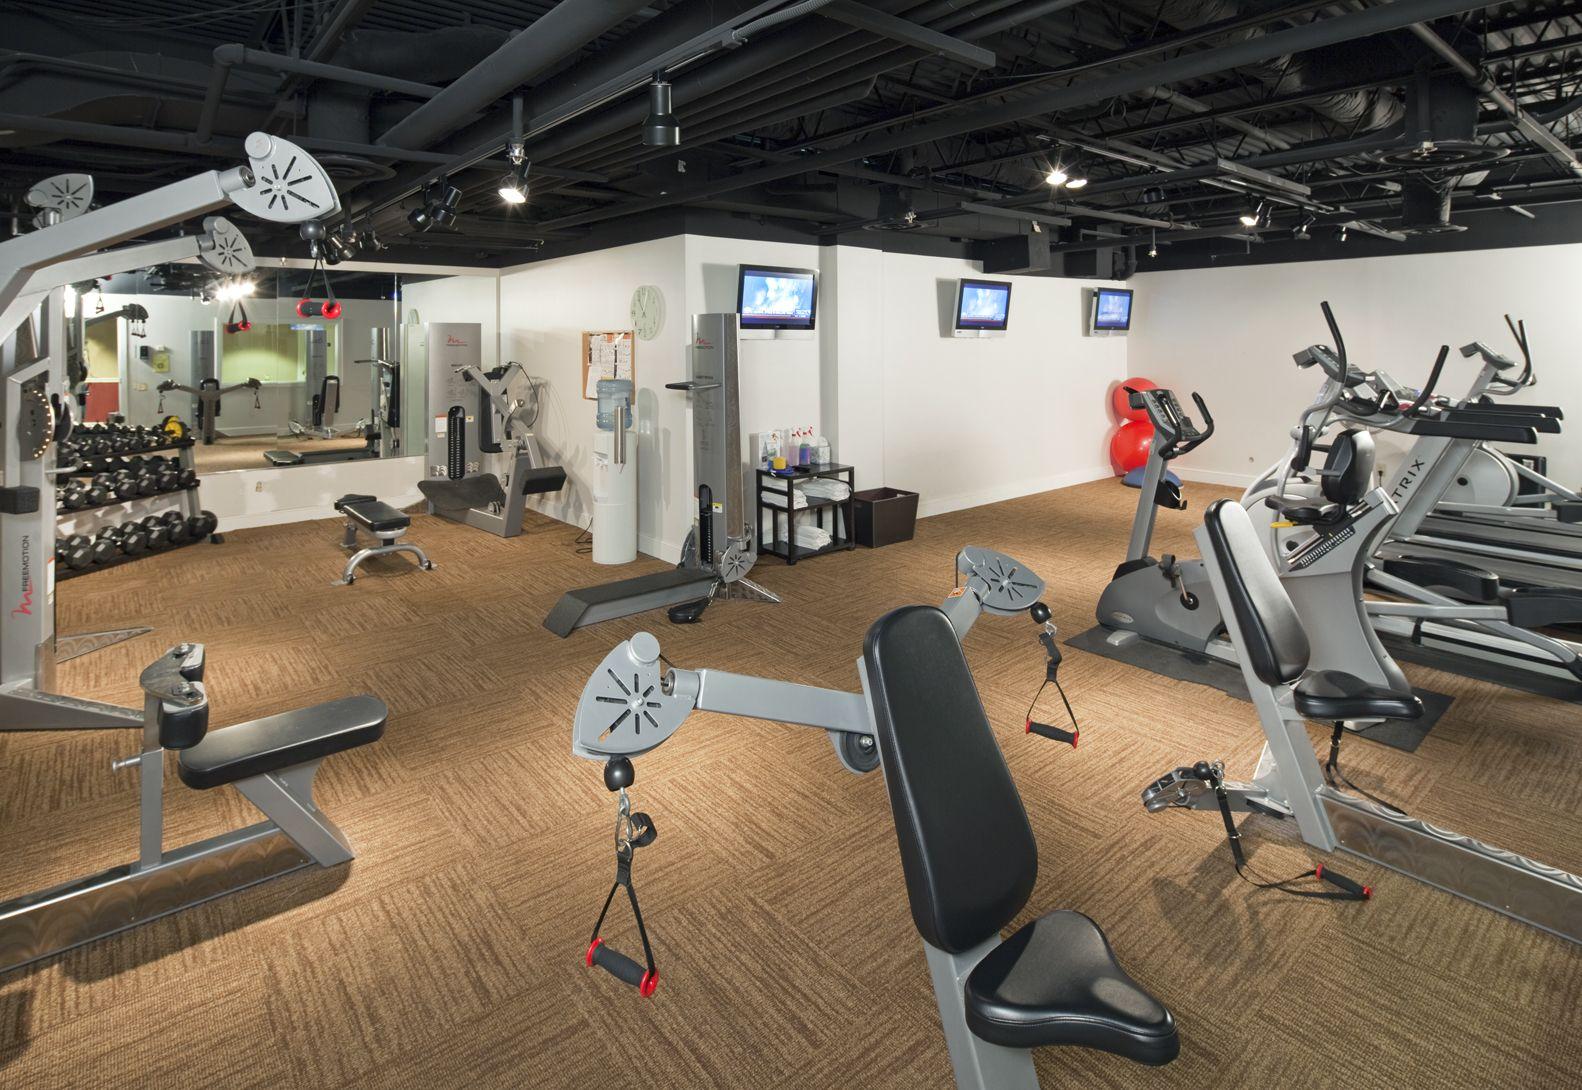 Fitness Center Field Club Of Omaha Fitness Center Fitness Gym Equipment